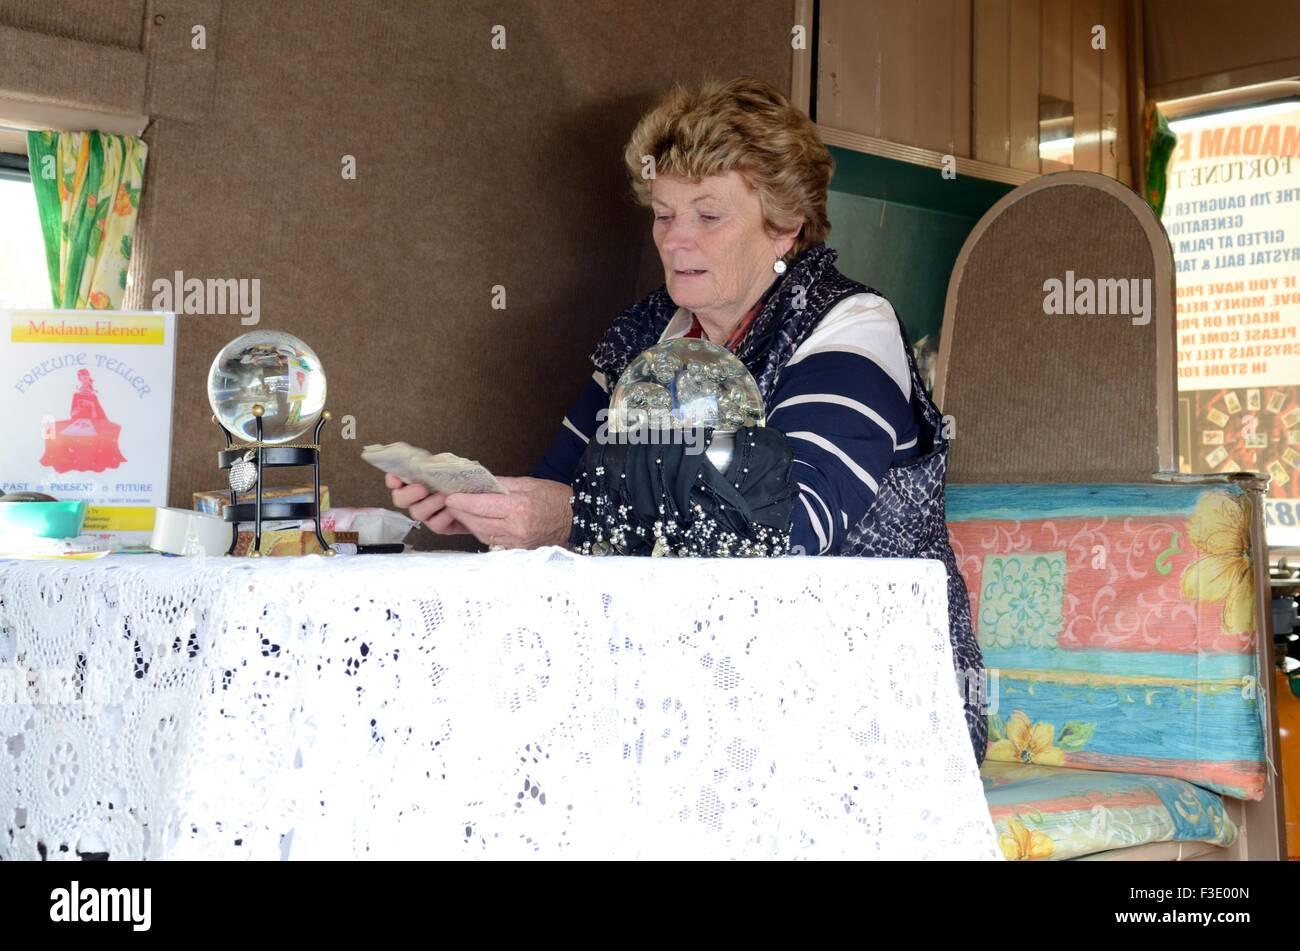 Fortune tellers in ireland